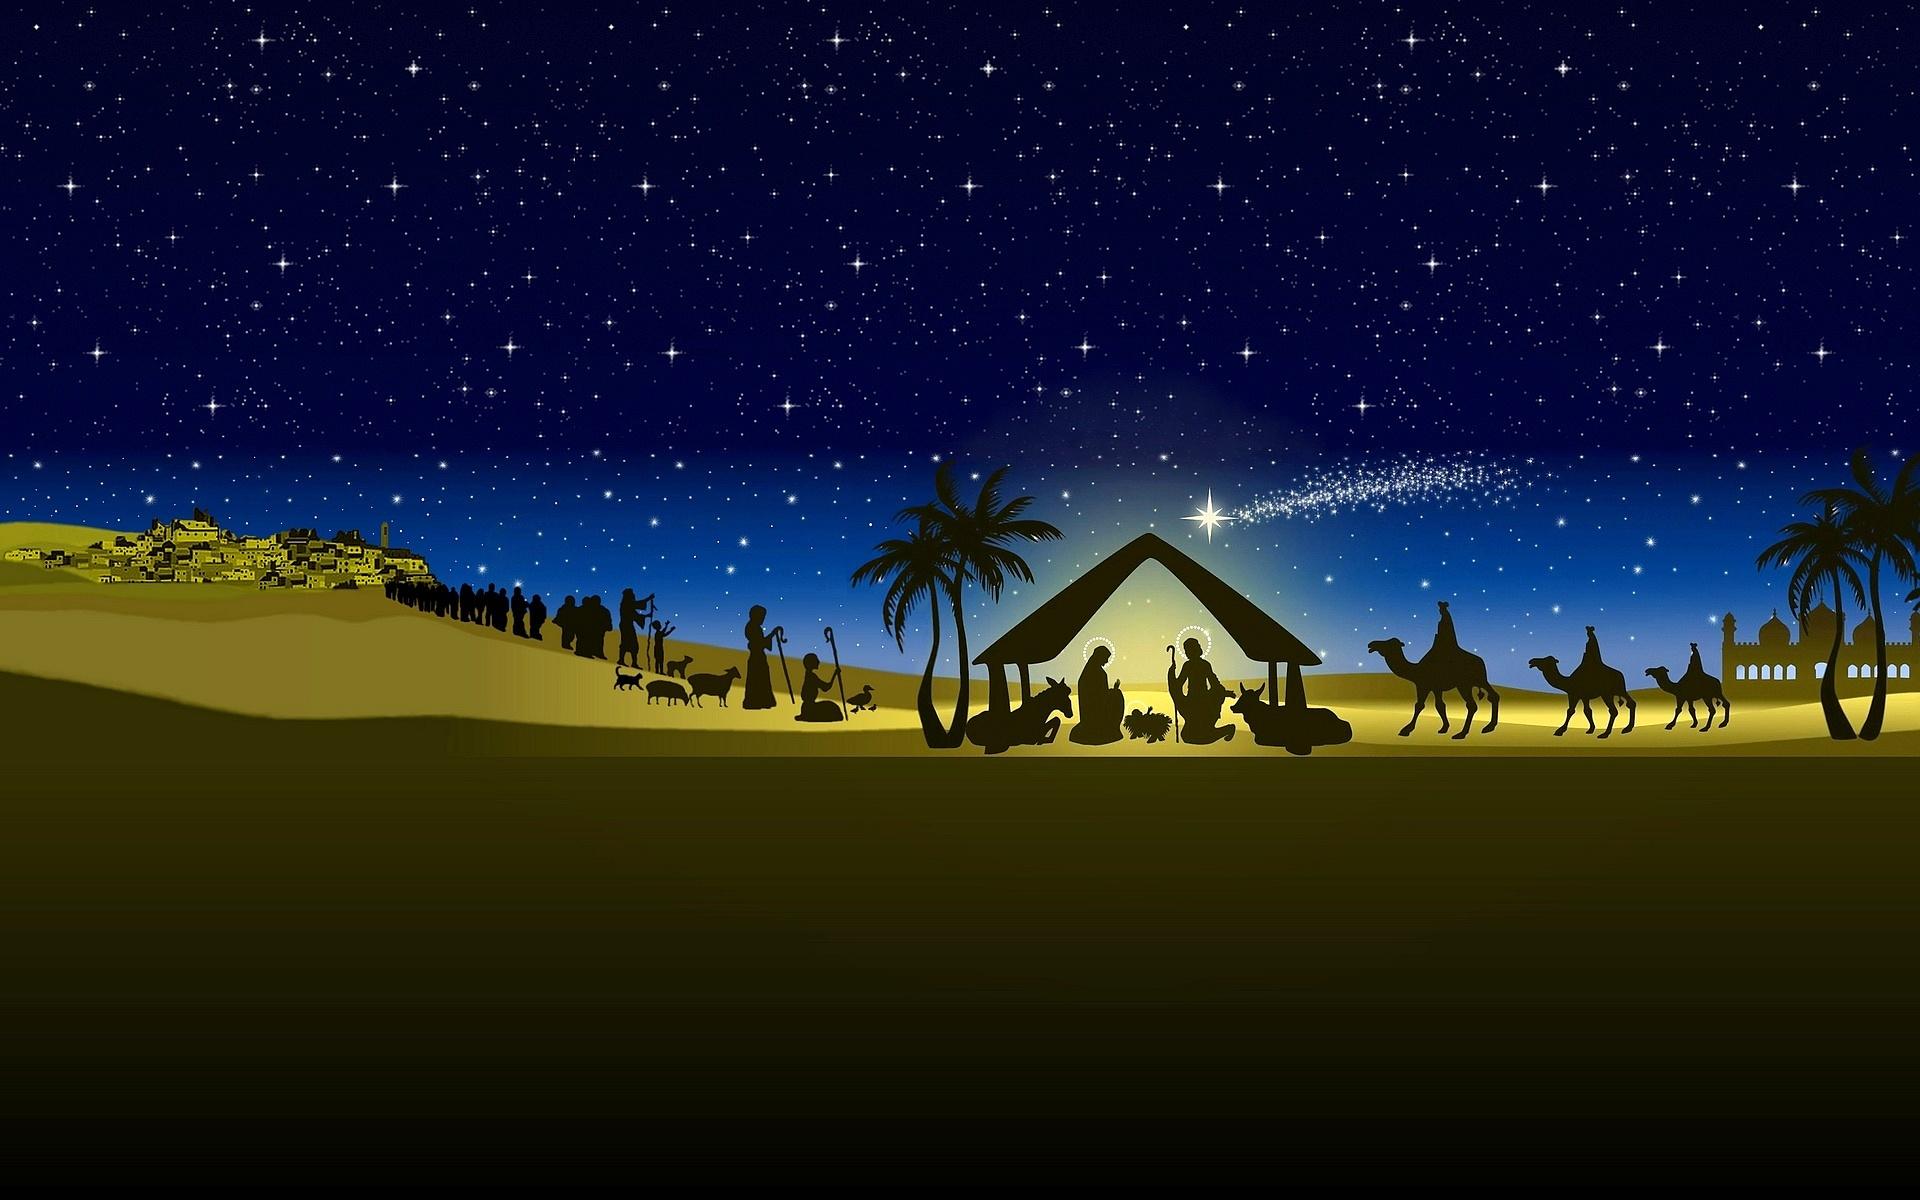 Animated Desktop Backgrounds Christmas